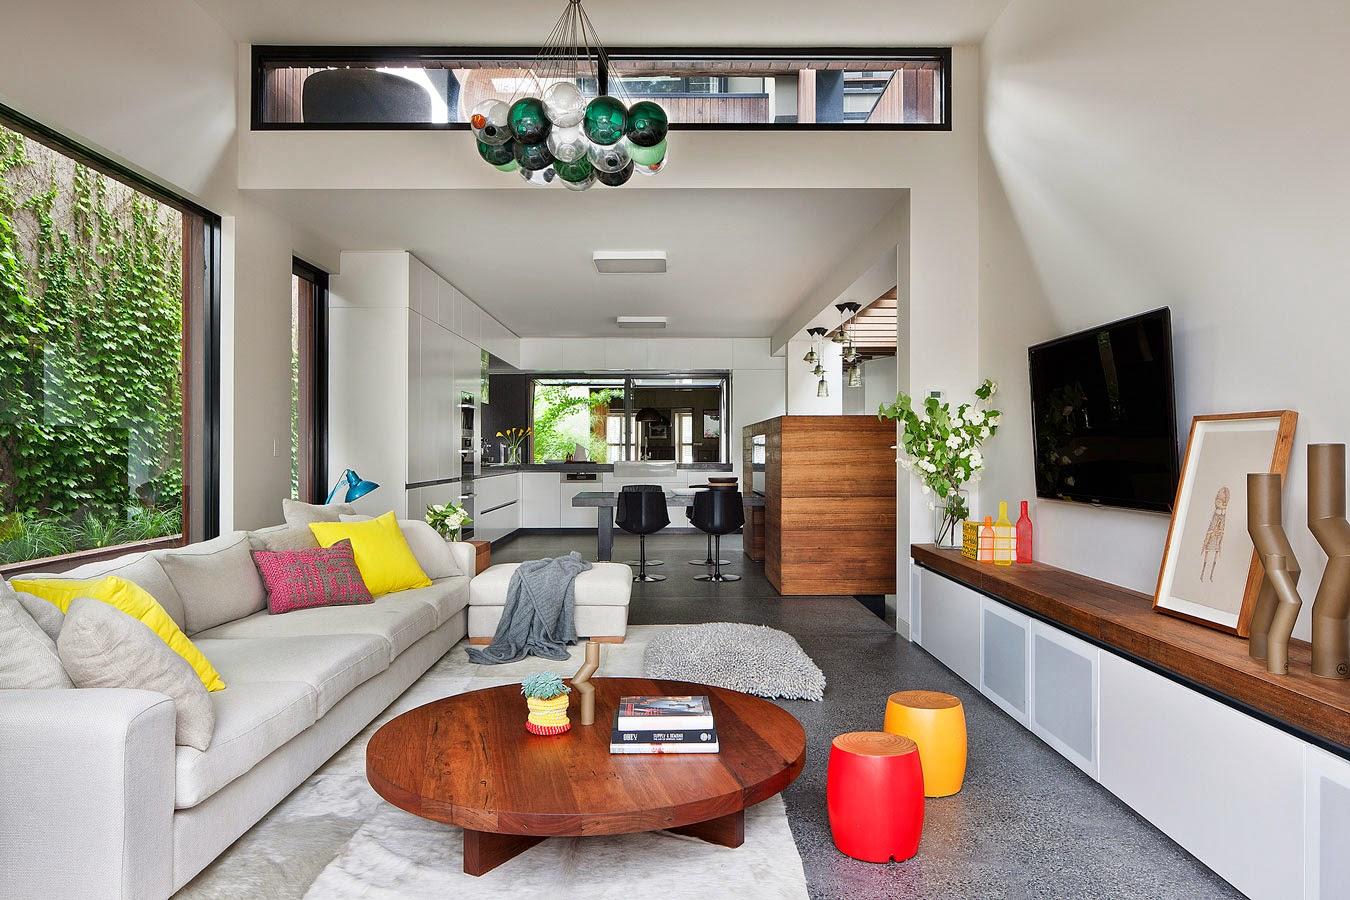 Interiores de casas decoradas 10 home tour que no puedes for Interiores de casas